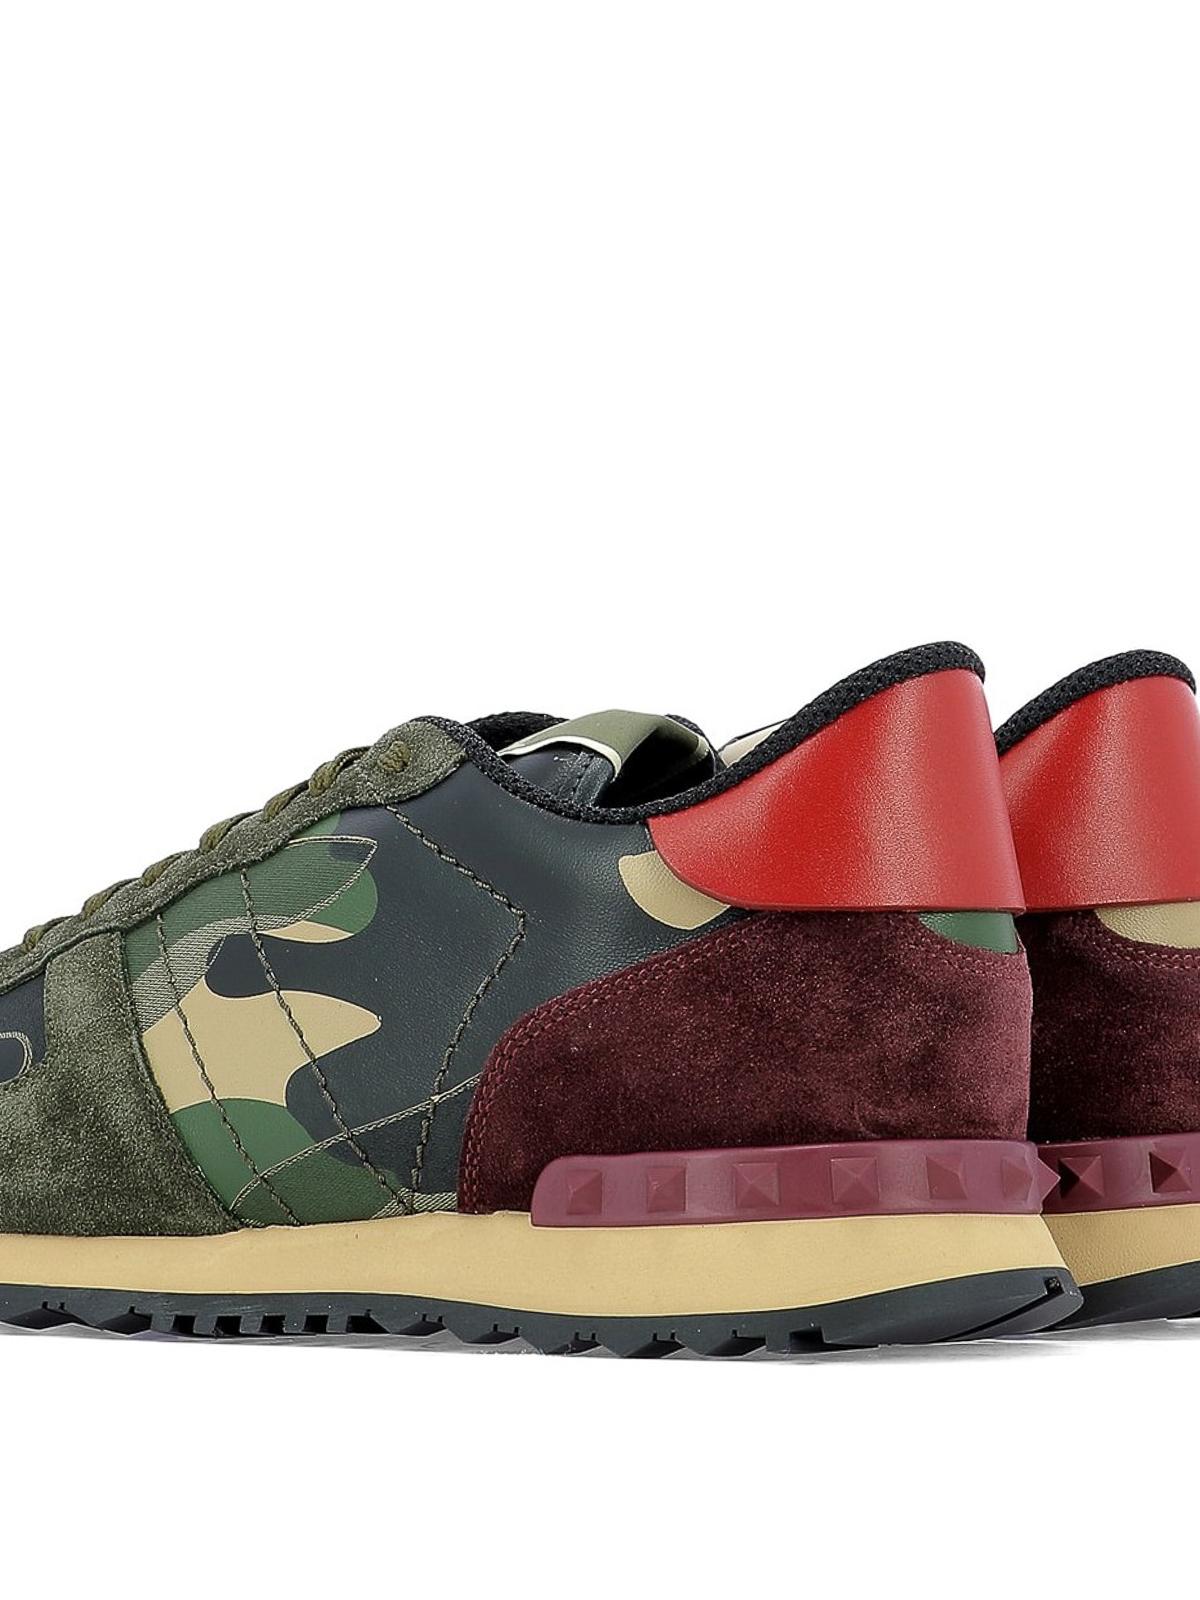 1dadaa2d8a59c Multicolour Rockrunner Camouflage sneakers shop online: VALENTINO GARAVANI